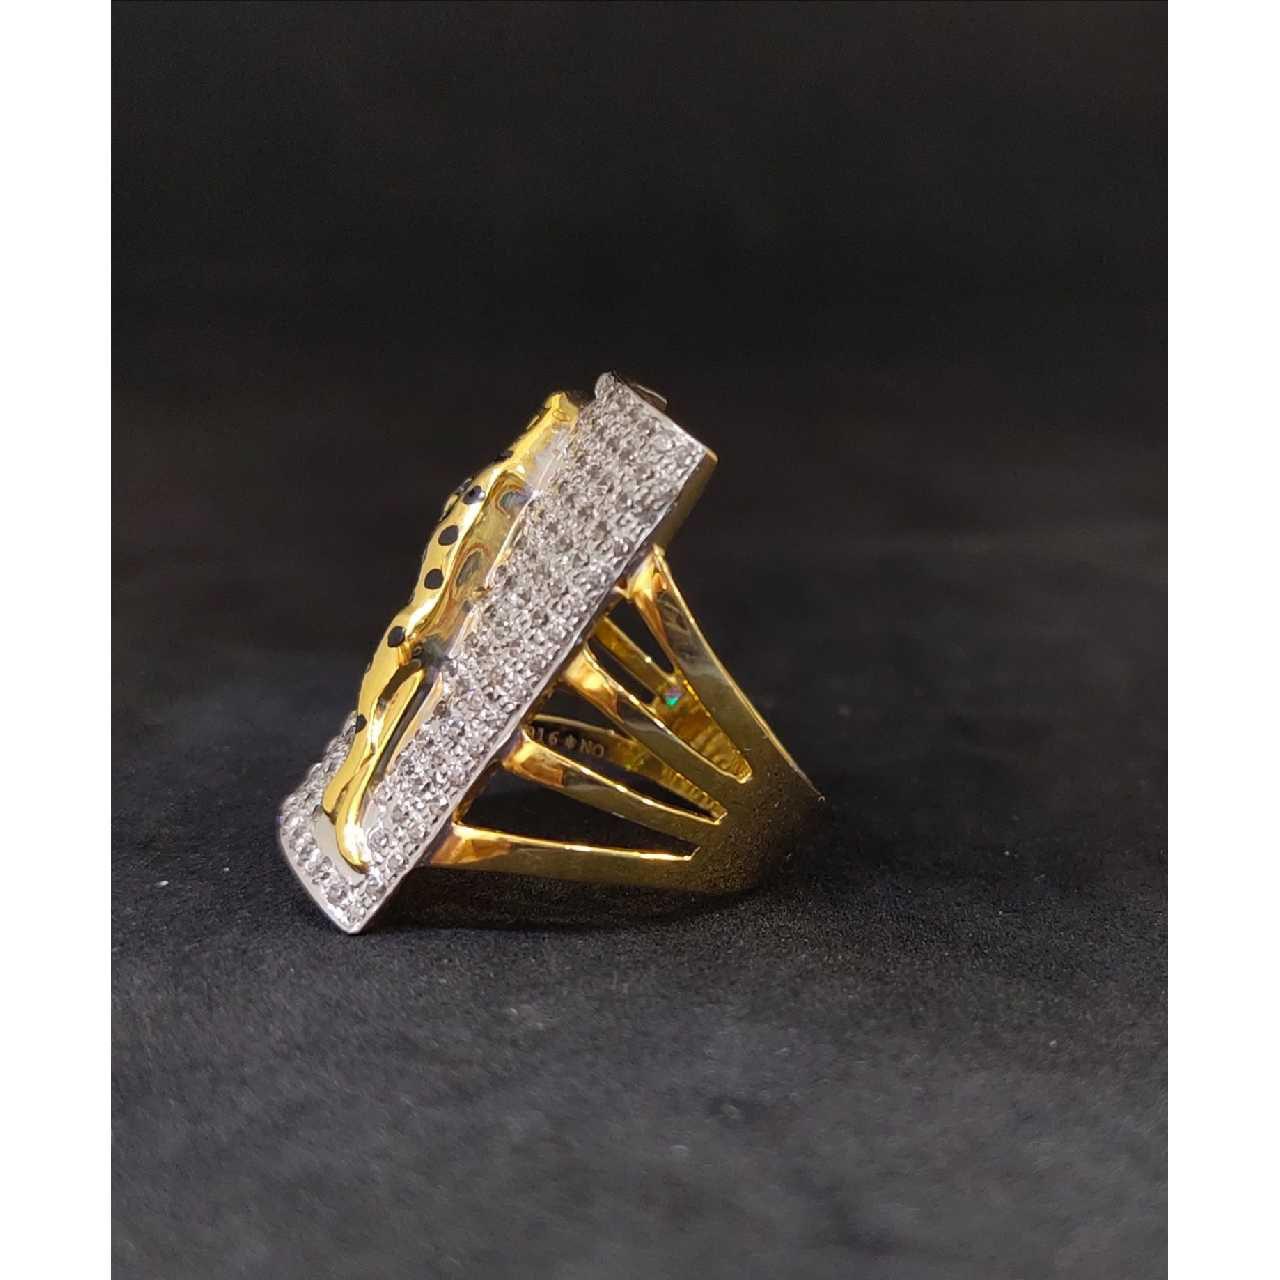 22k Cz Gents Jaugar Fancy Gold Ring 27364